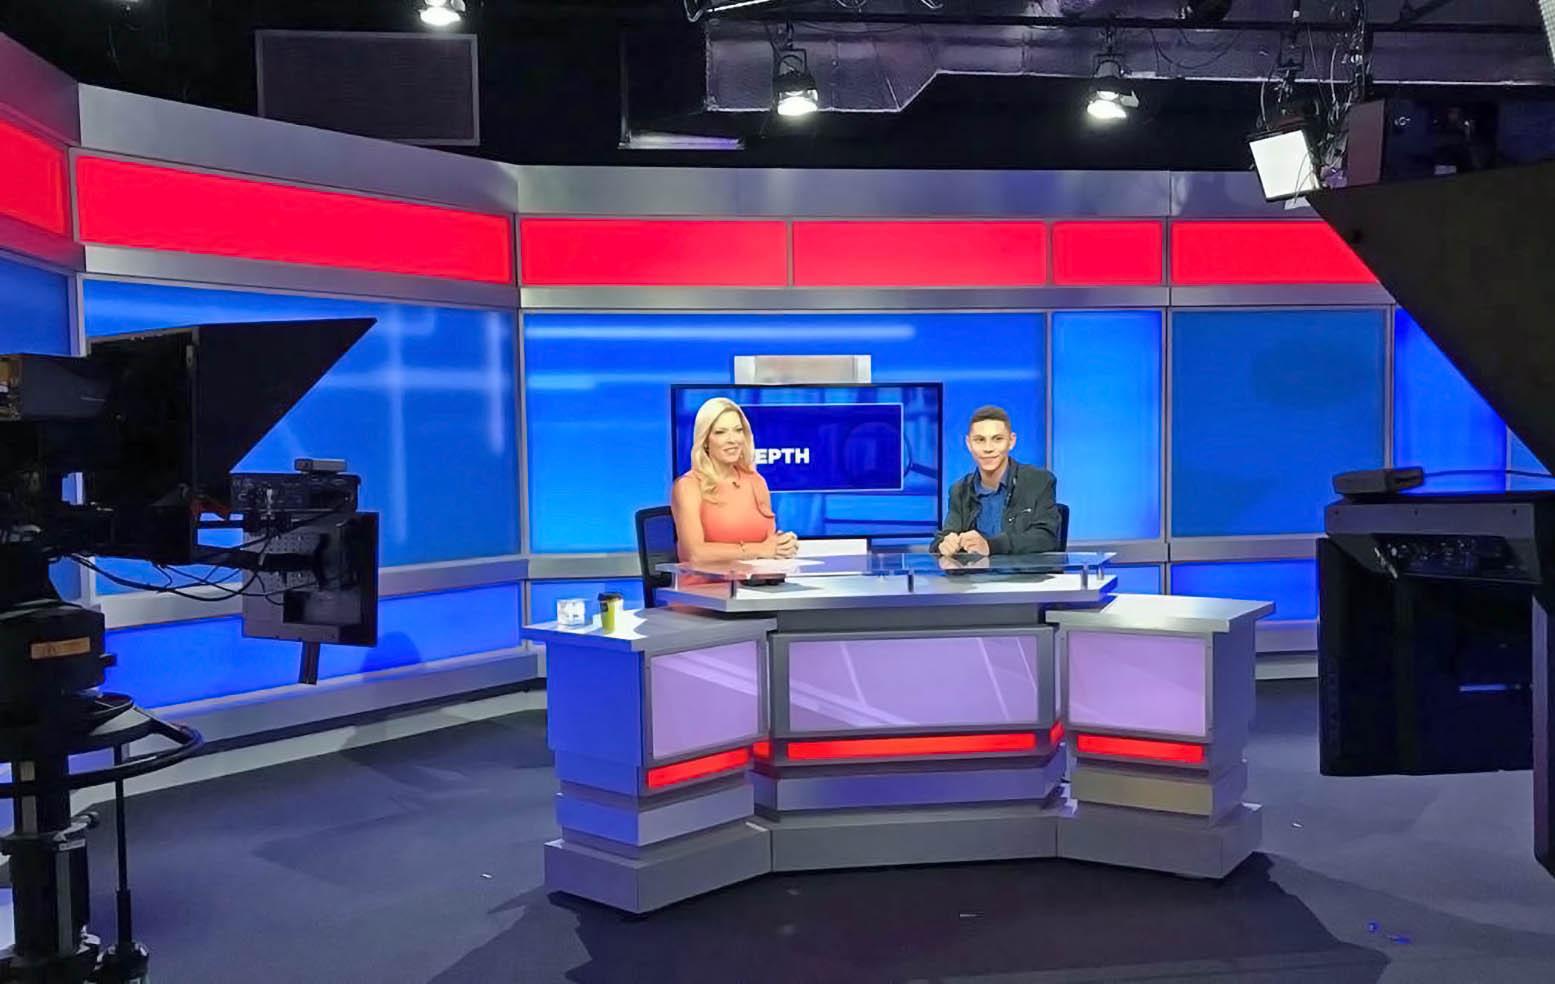 Spectrum Bay News 9 St. Petersburgh interview set